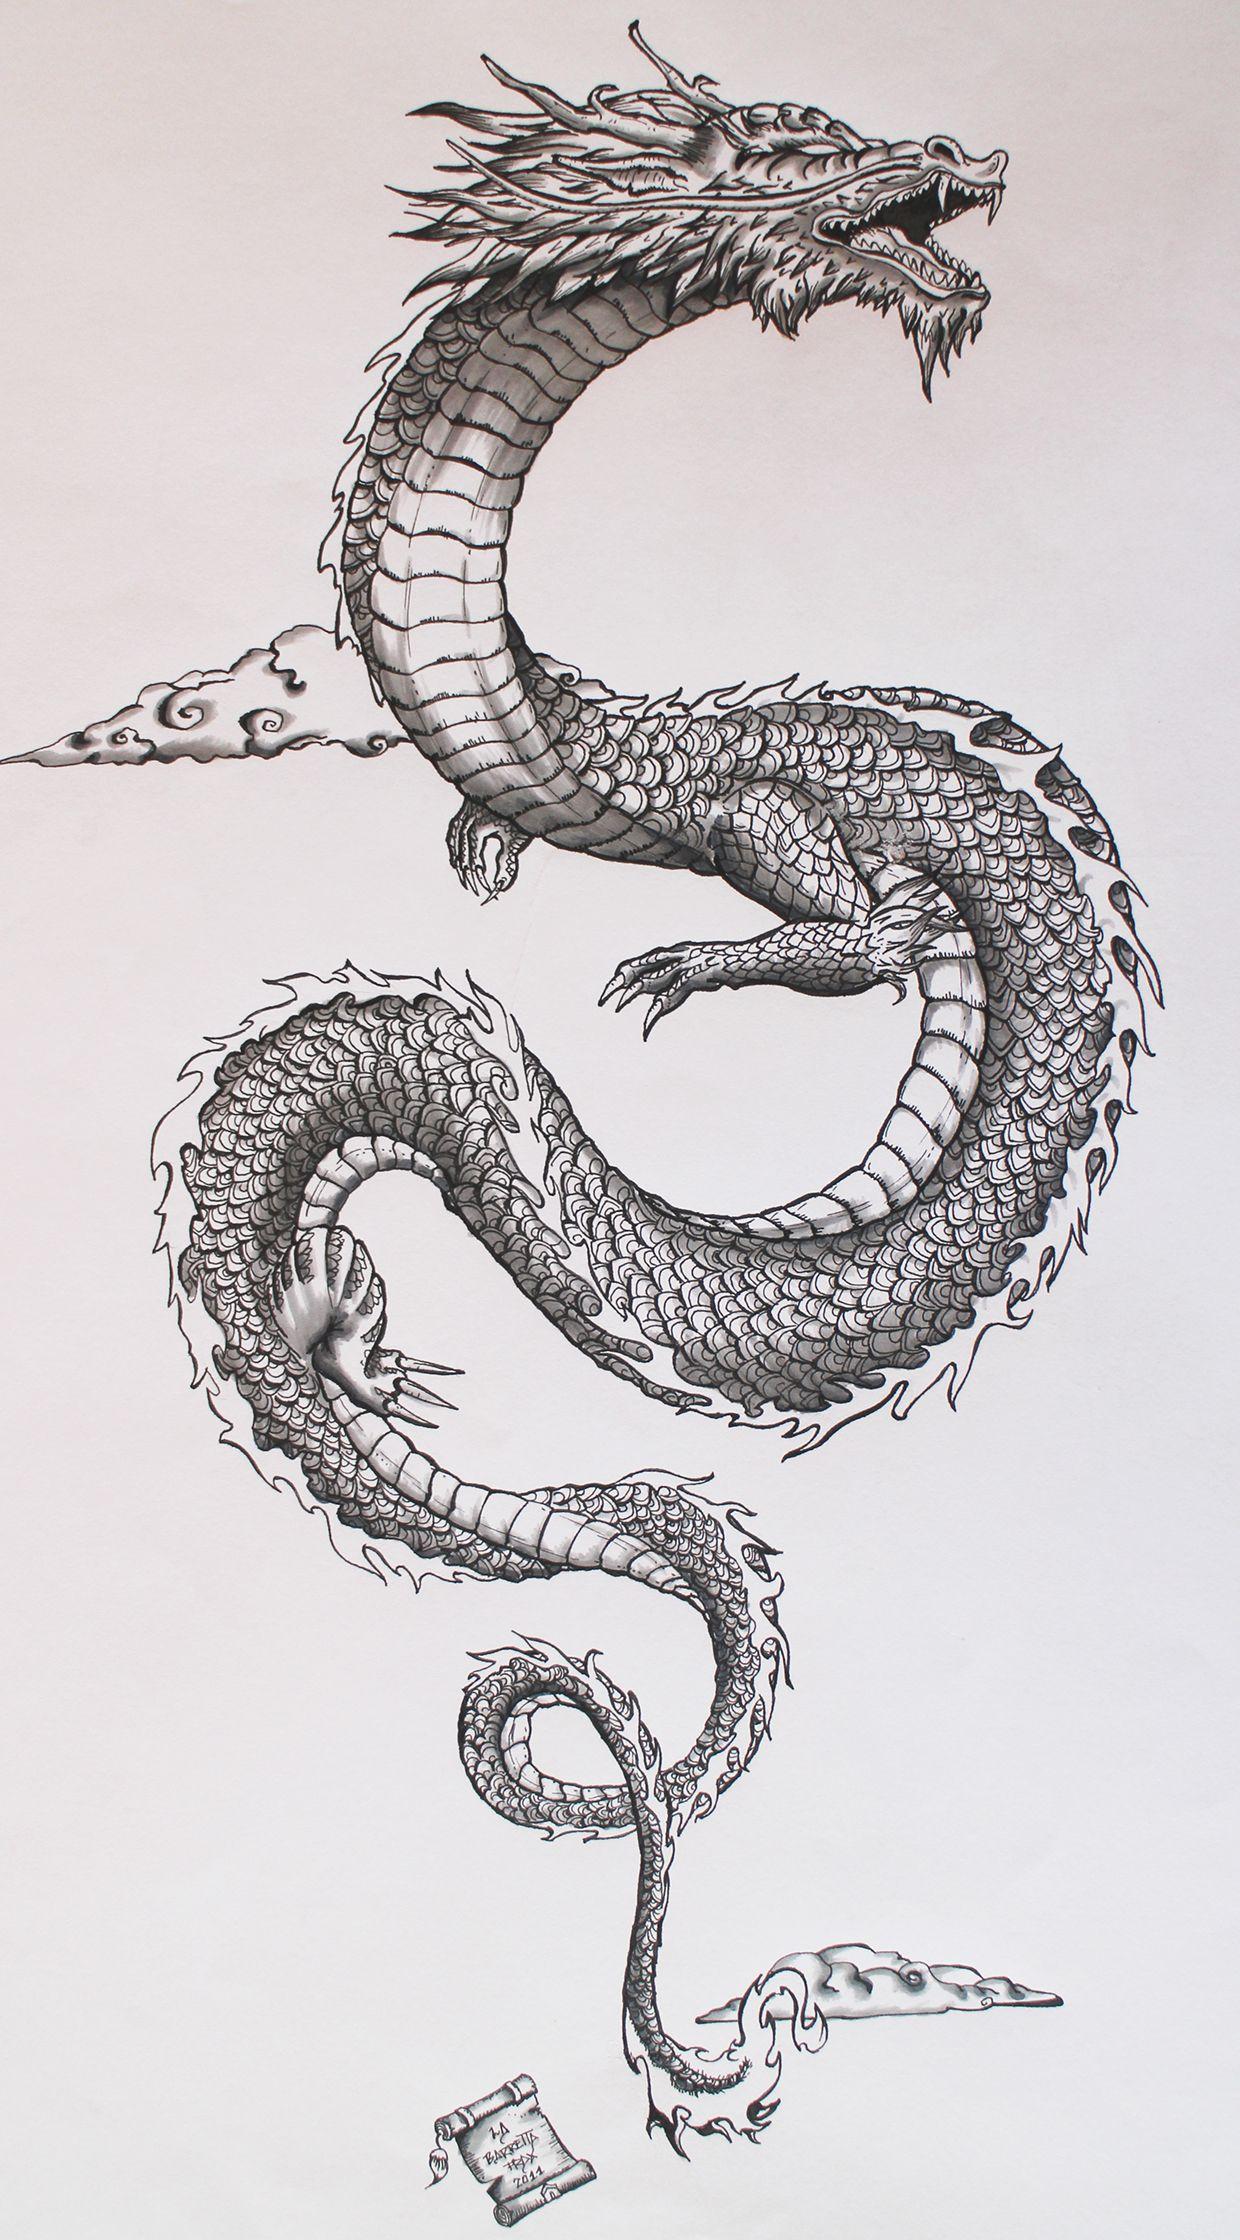 Welsh dragon tattoo designs - My Personal Interpretation Of The Traditional Japanese Dragon